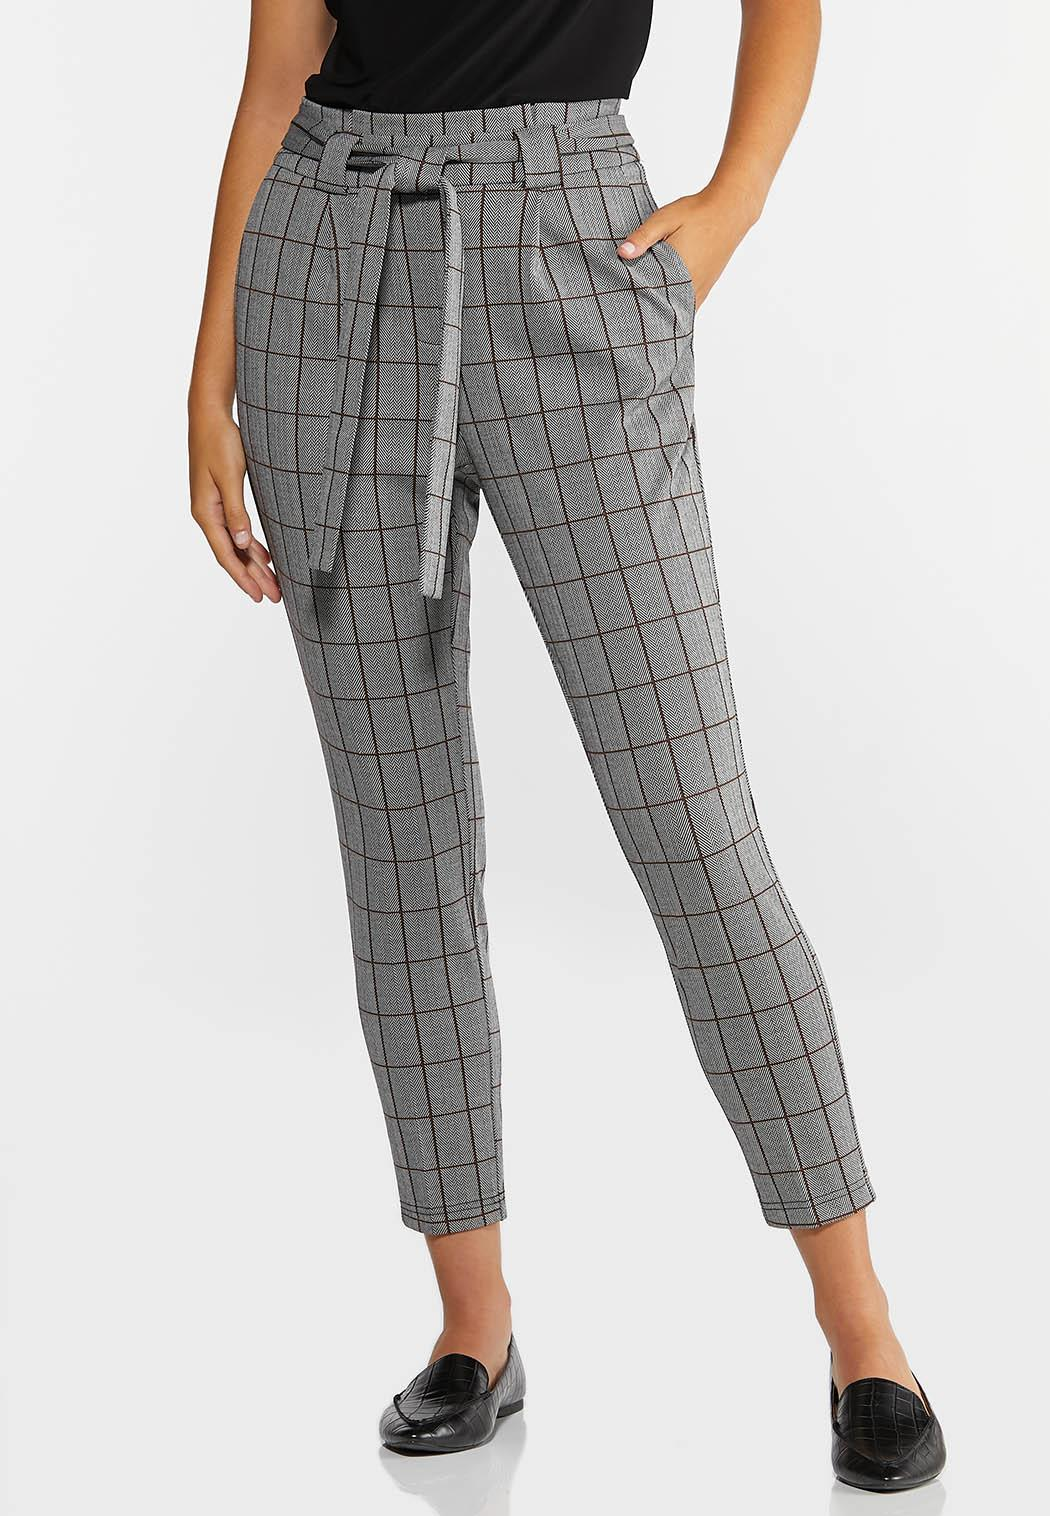 Petite Plaid Paperbag Trousers